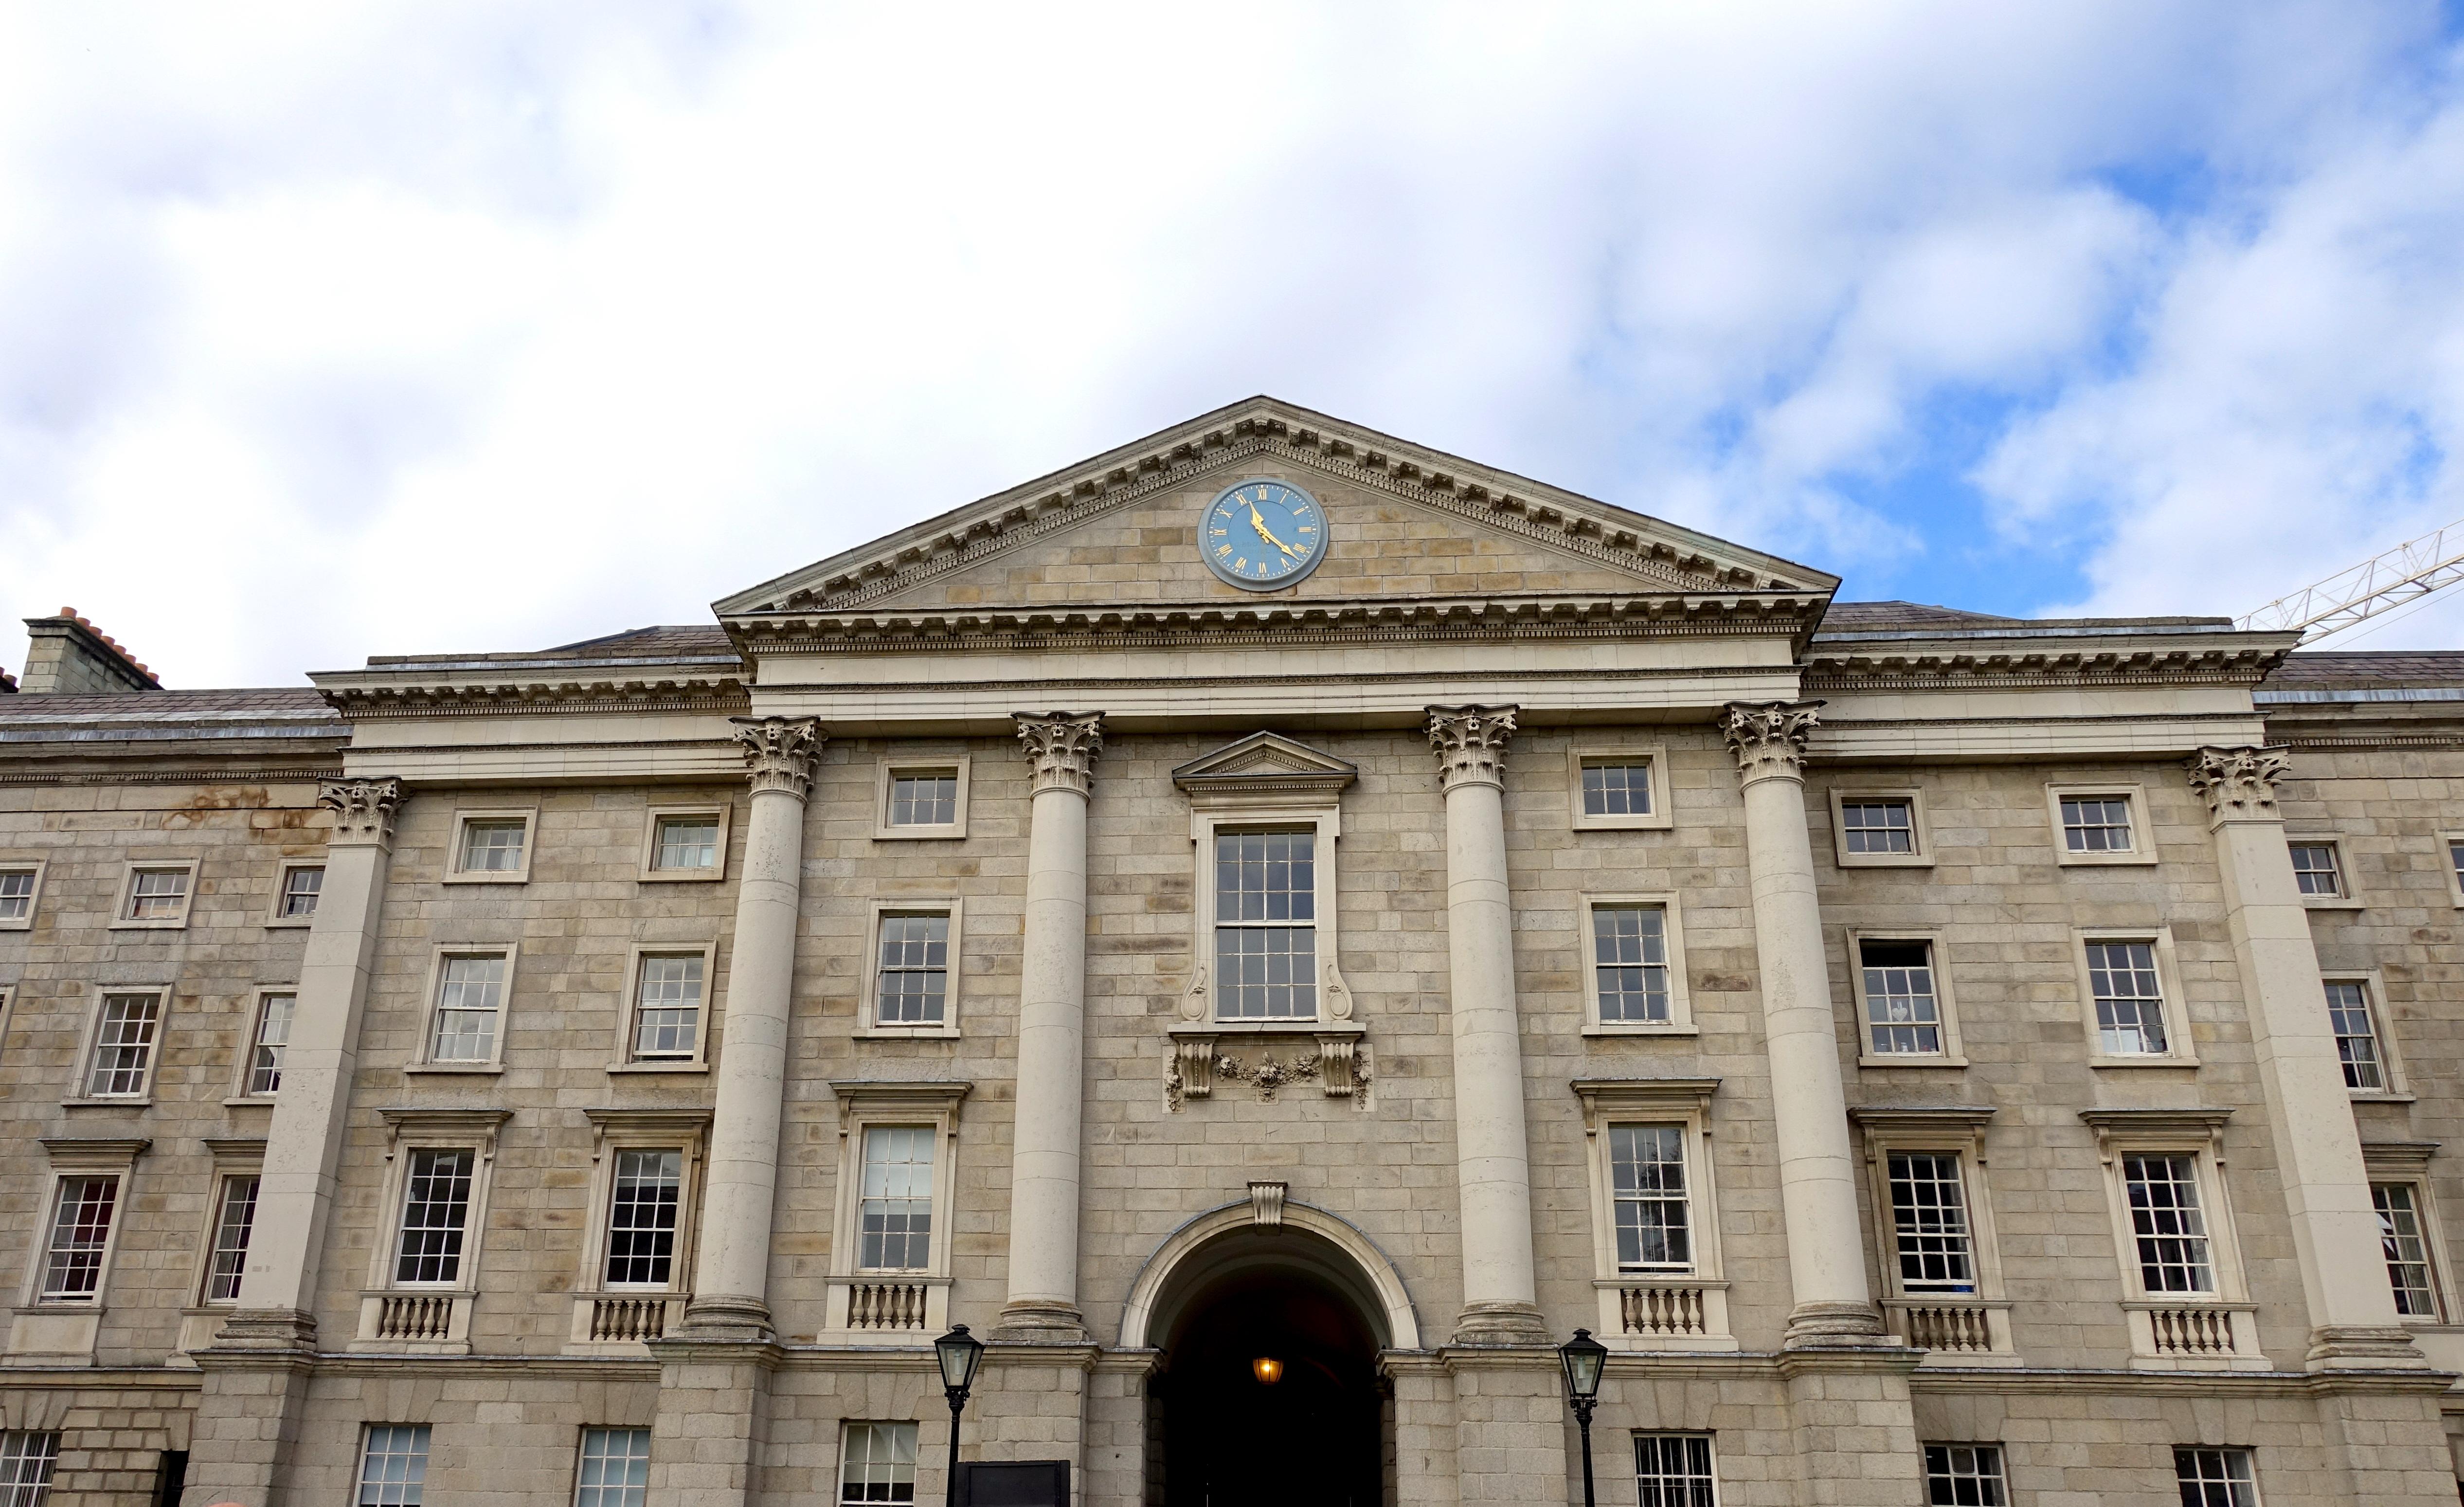 trinity-college-dublin-ireland-lustforthesublime